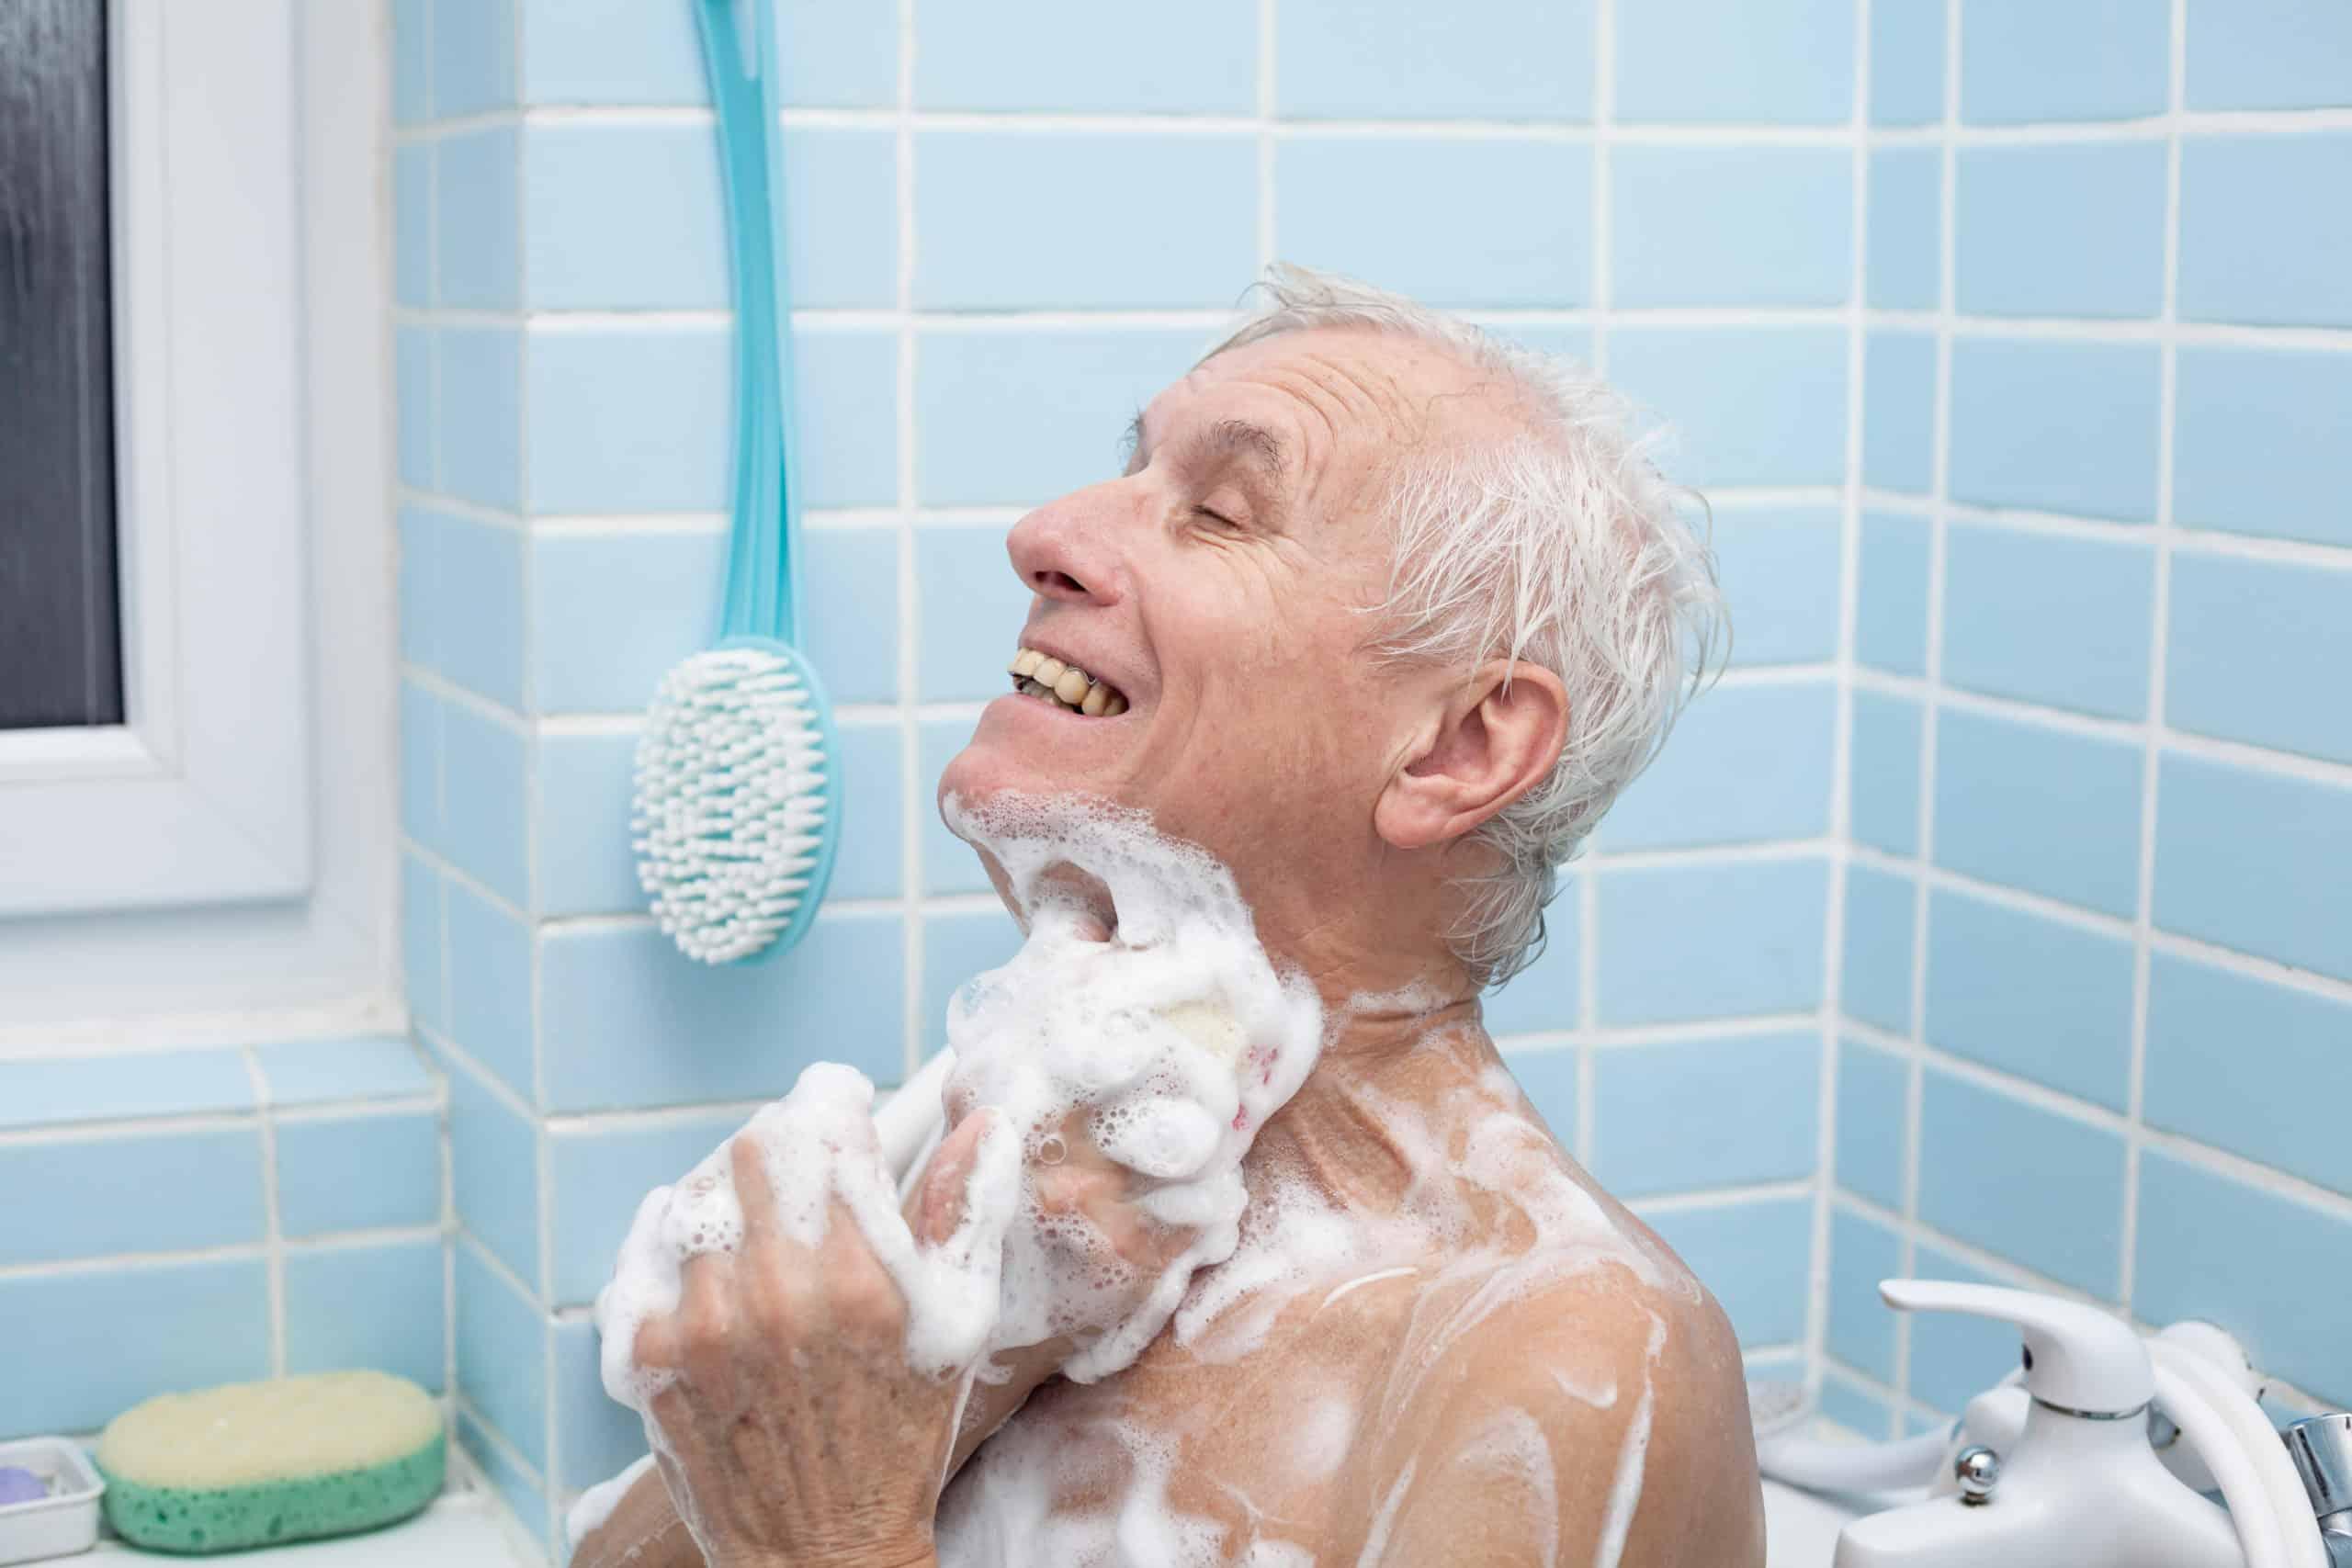 Senior man washing his body with soap in bath.